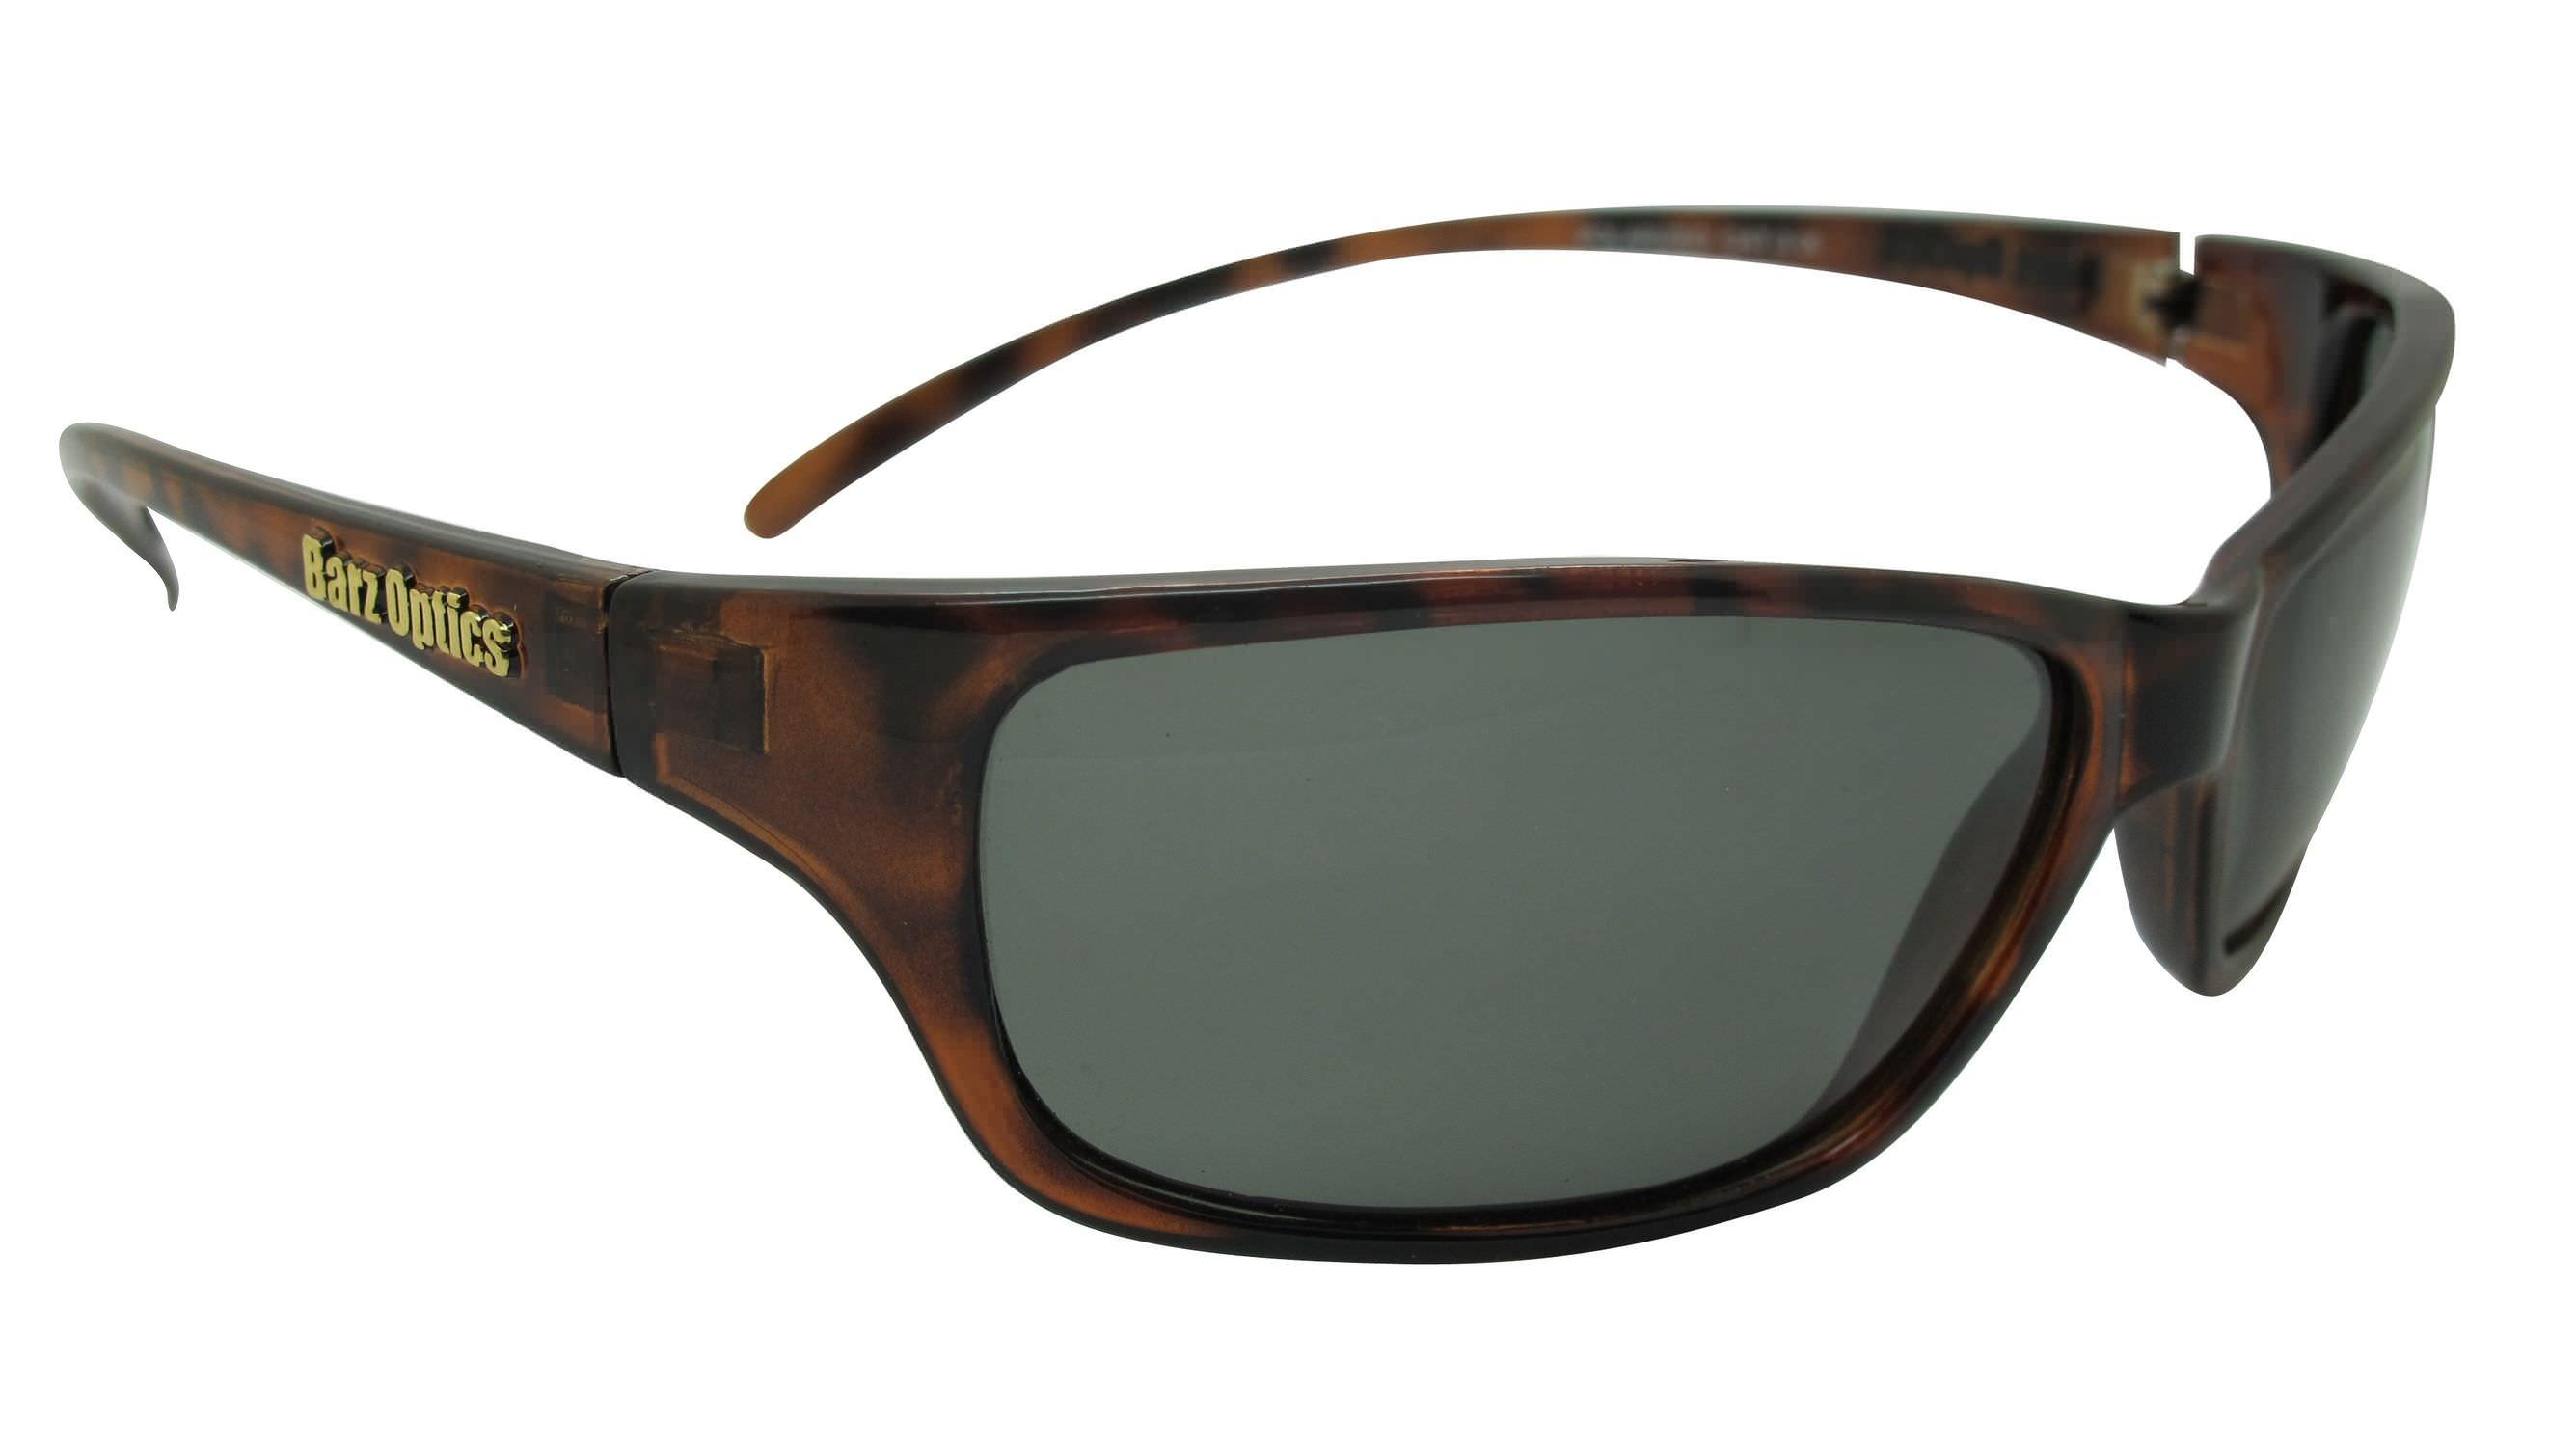 7172bc5ff86eb Polarized sunglasses   watersports - BALI - Barz Optics